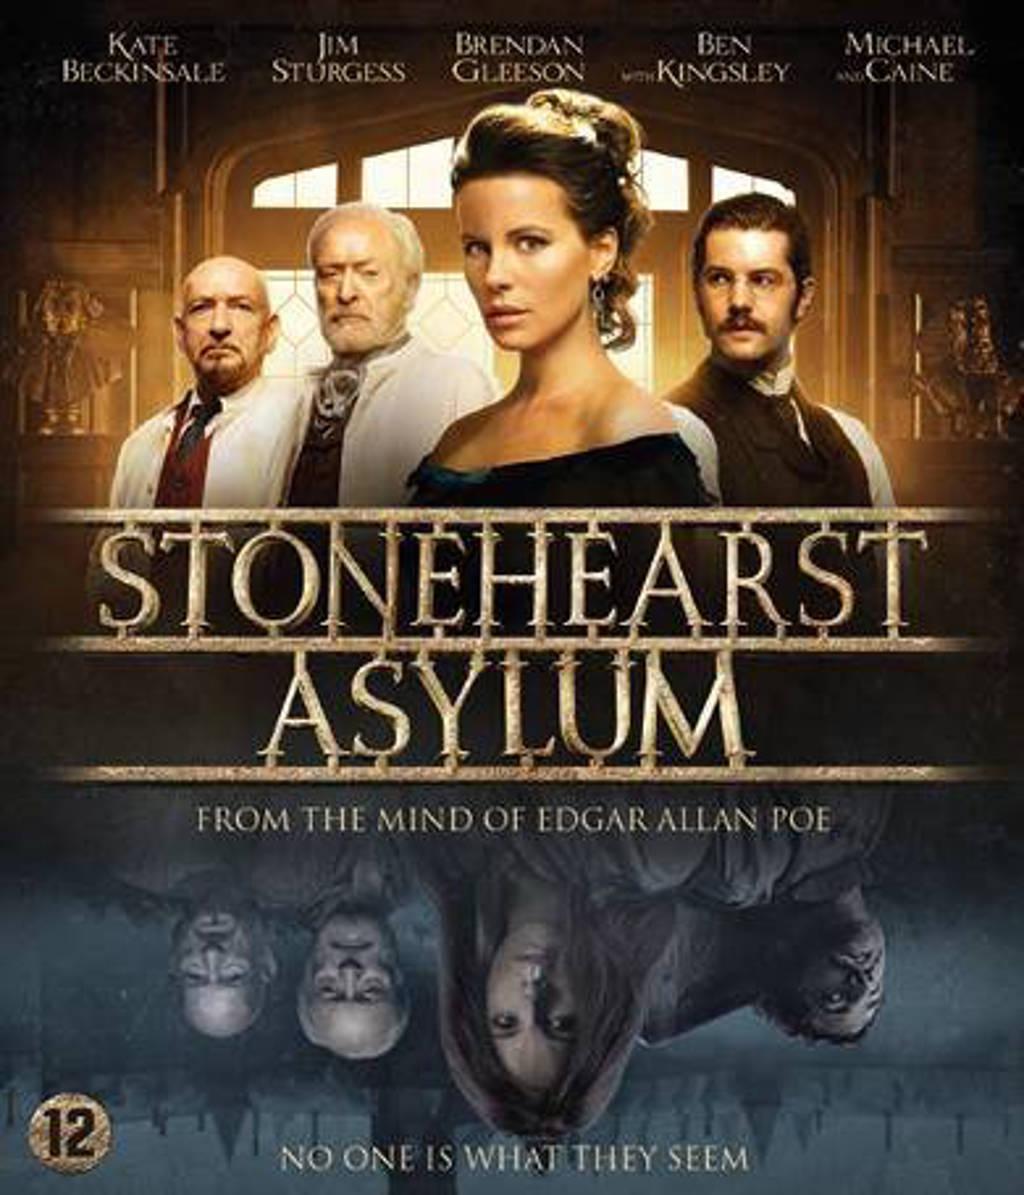 Stonehearst asylum (Blu-ray)